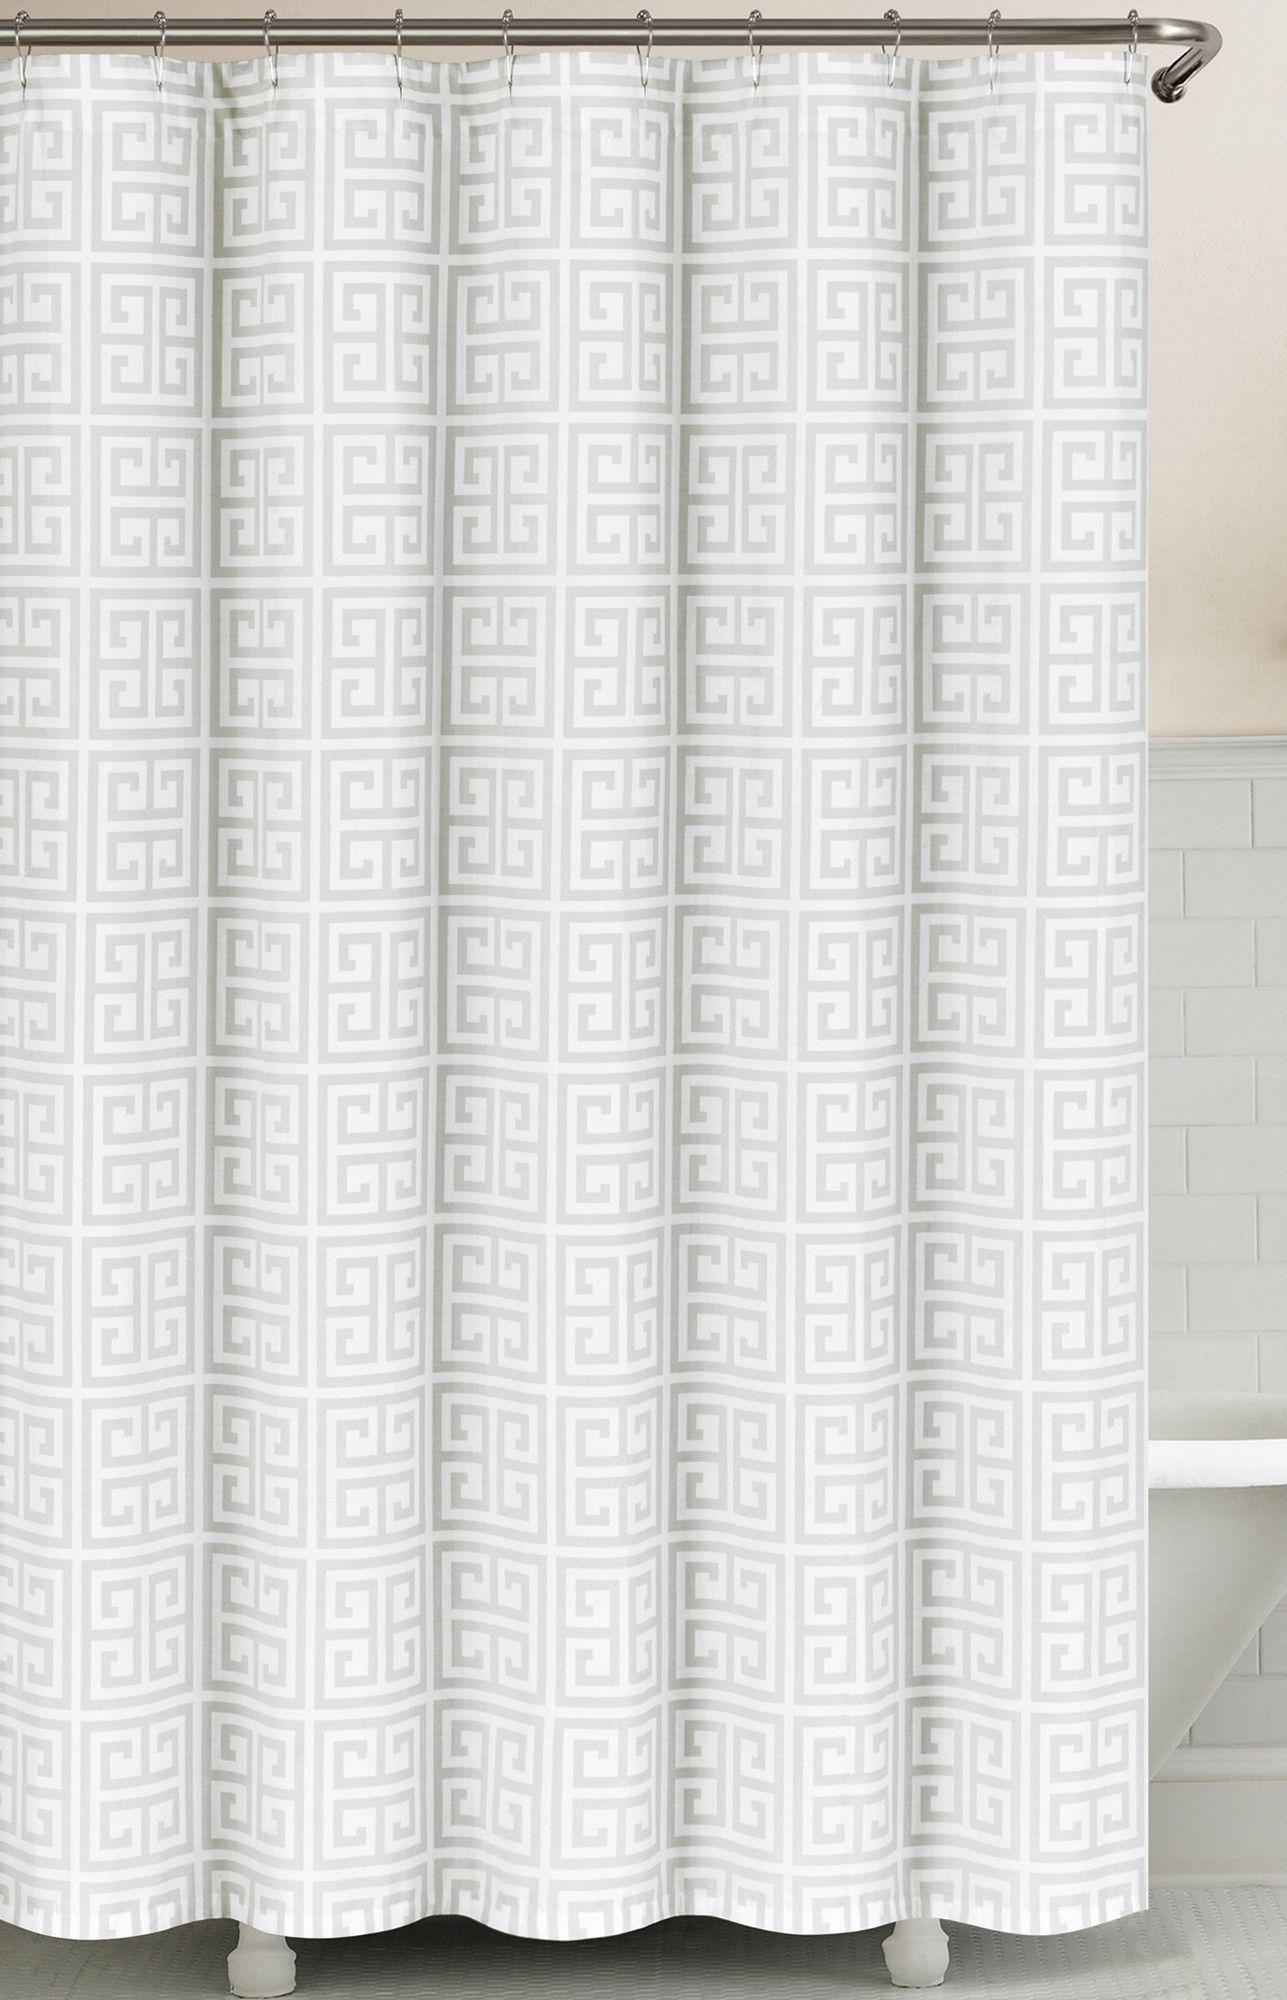 Greek Key Shower Curtain Curtains Shower Curtain Fabric Shower